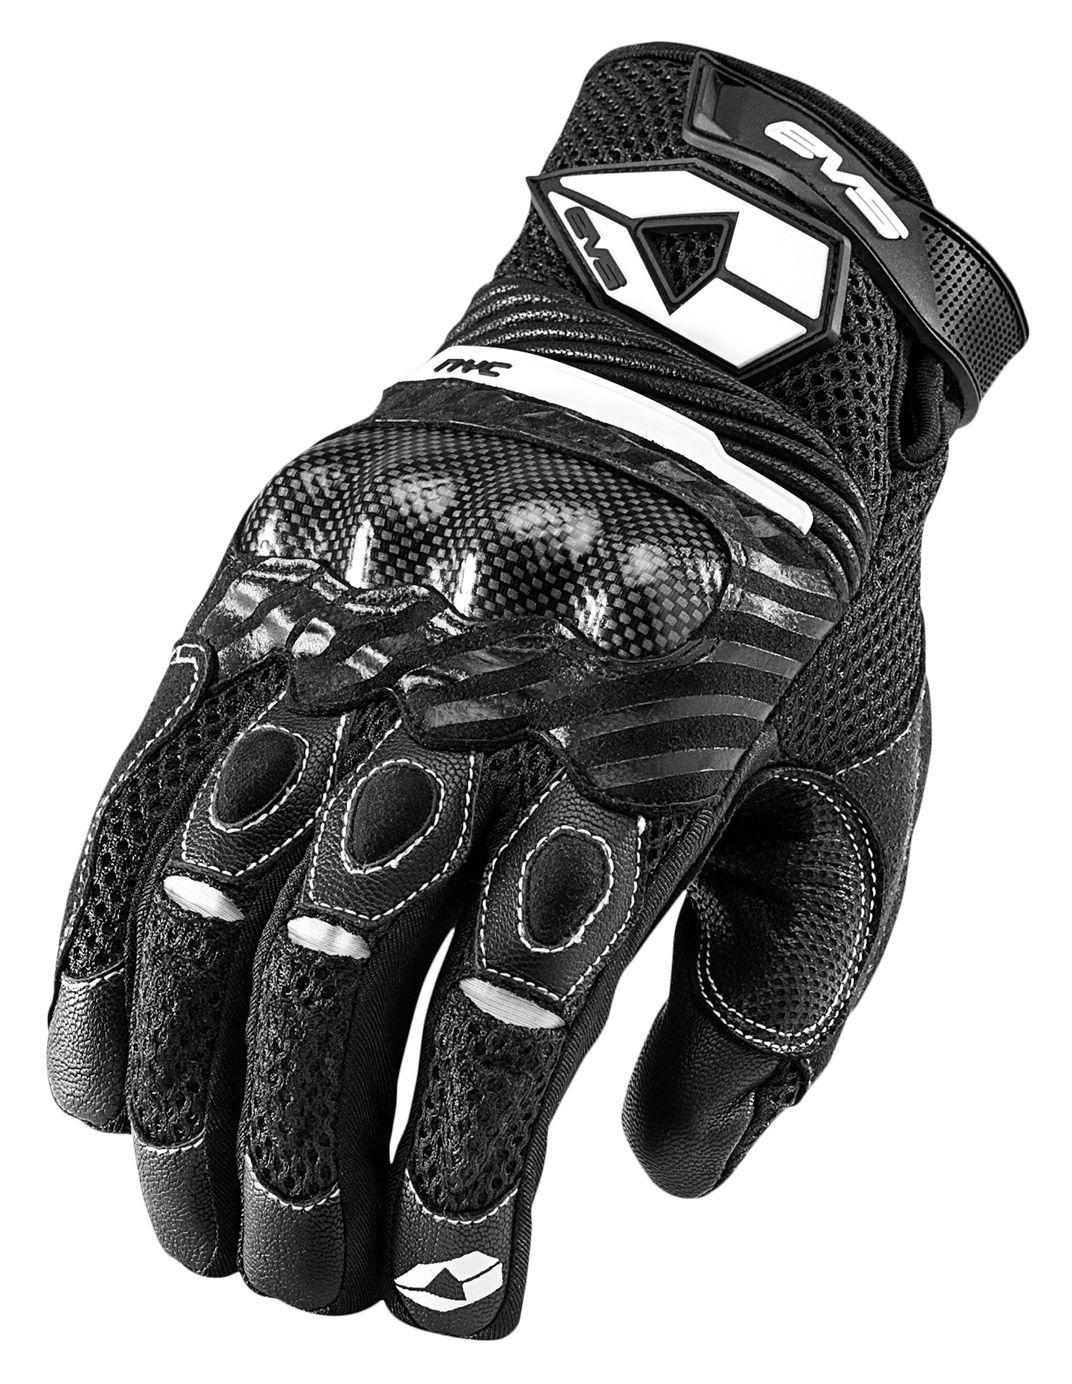 Motorcycle gloves nyc - Motorcycle Gloves Nyc 1